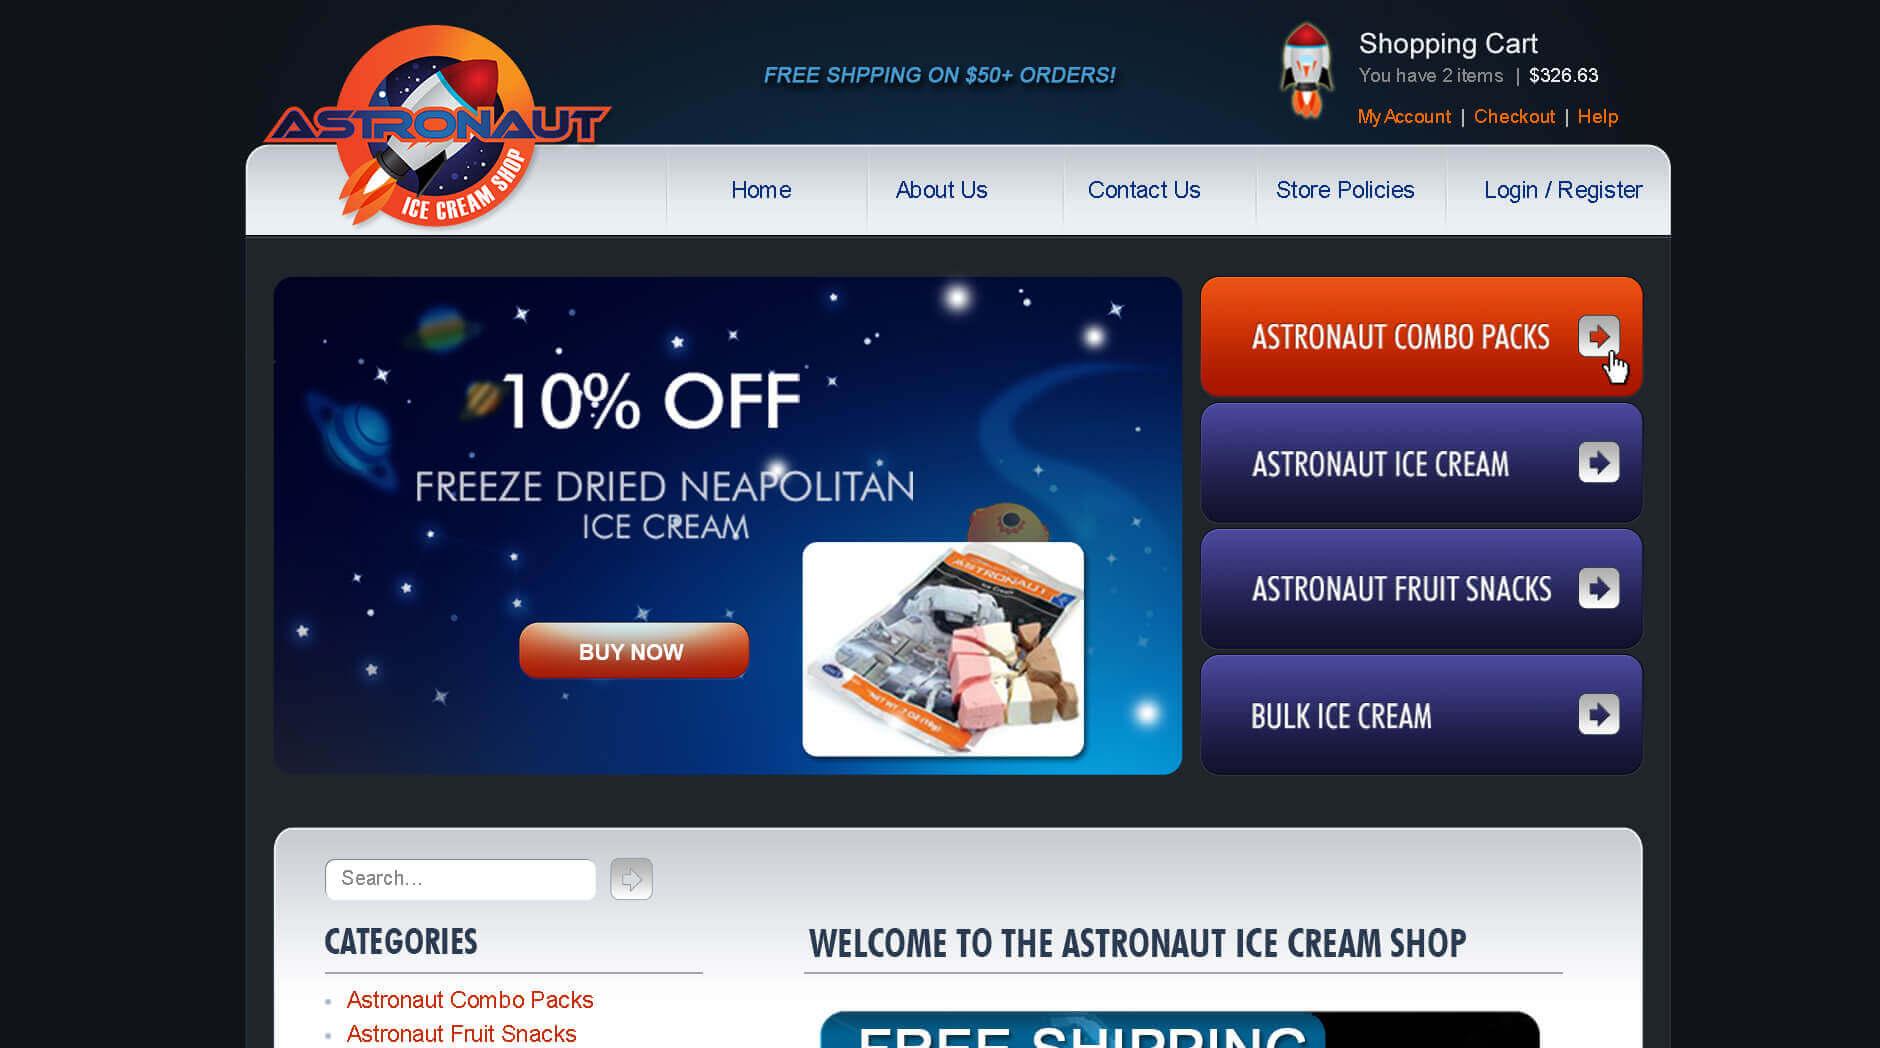 Astronaut Ice Cream Shop 1 Astronaut Ice Cream Shop